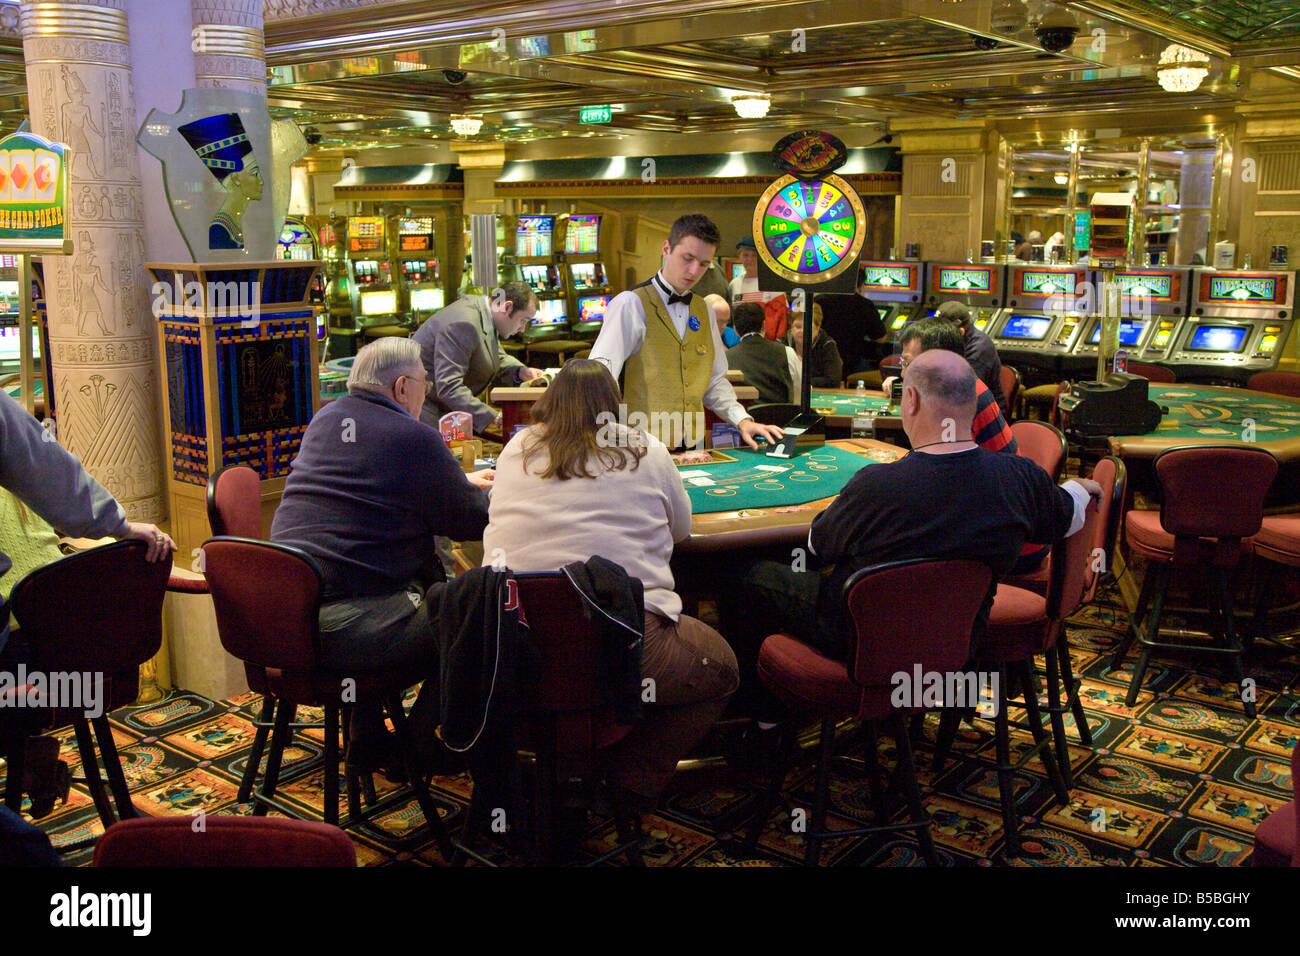 Online Casino Blackjack Live - 95667